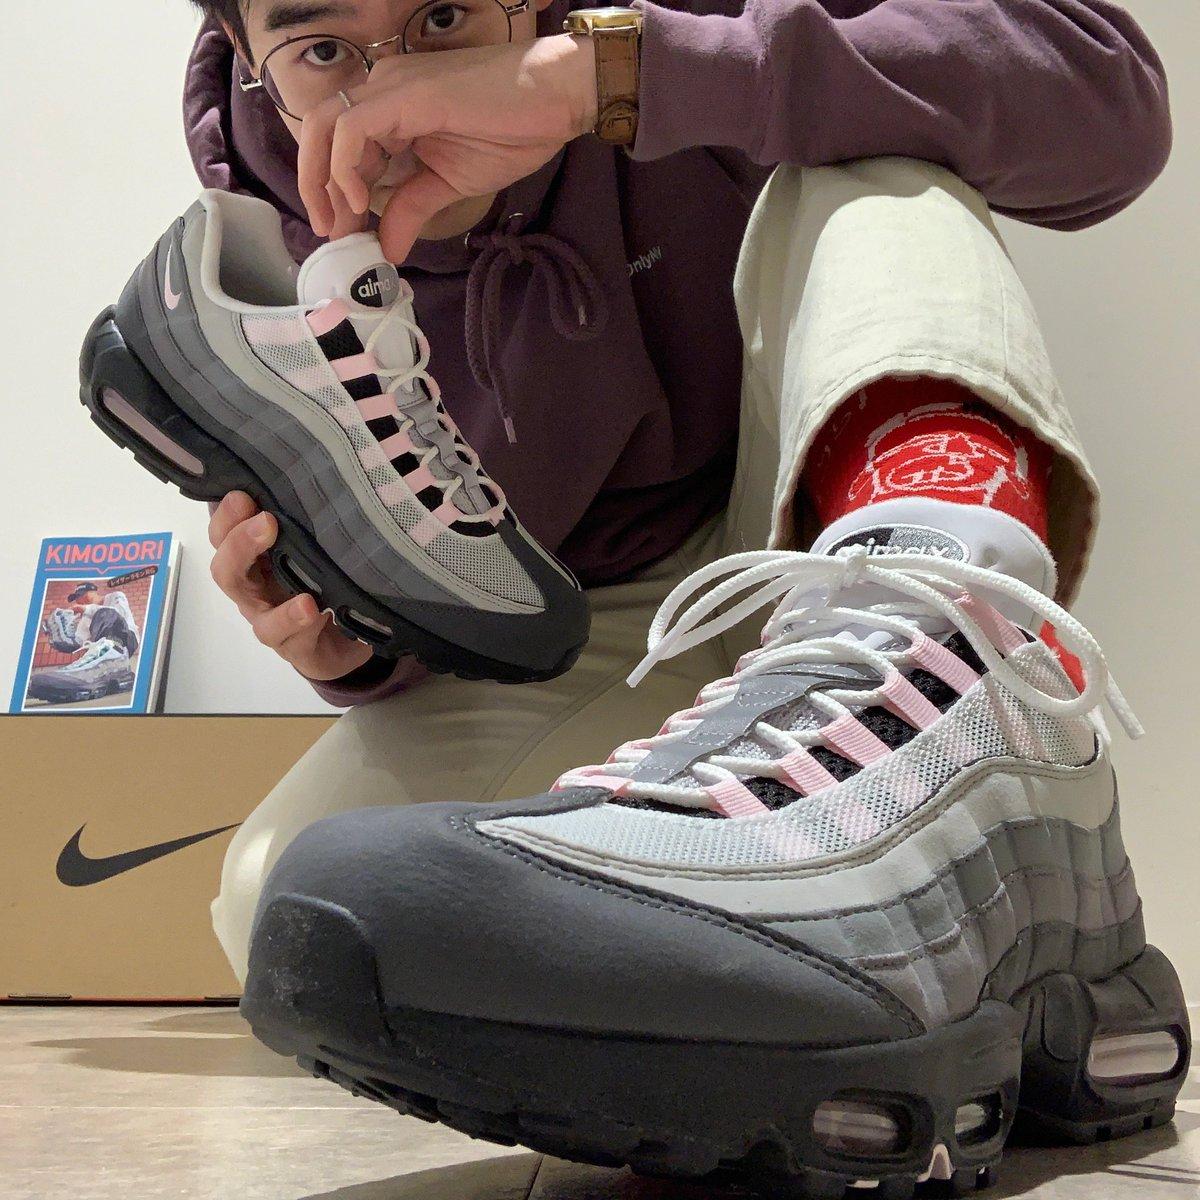 Sneaker Steal On Twitter New Nike Air Max 95 Premium Pink